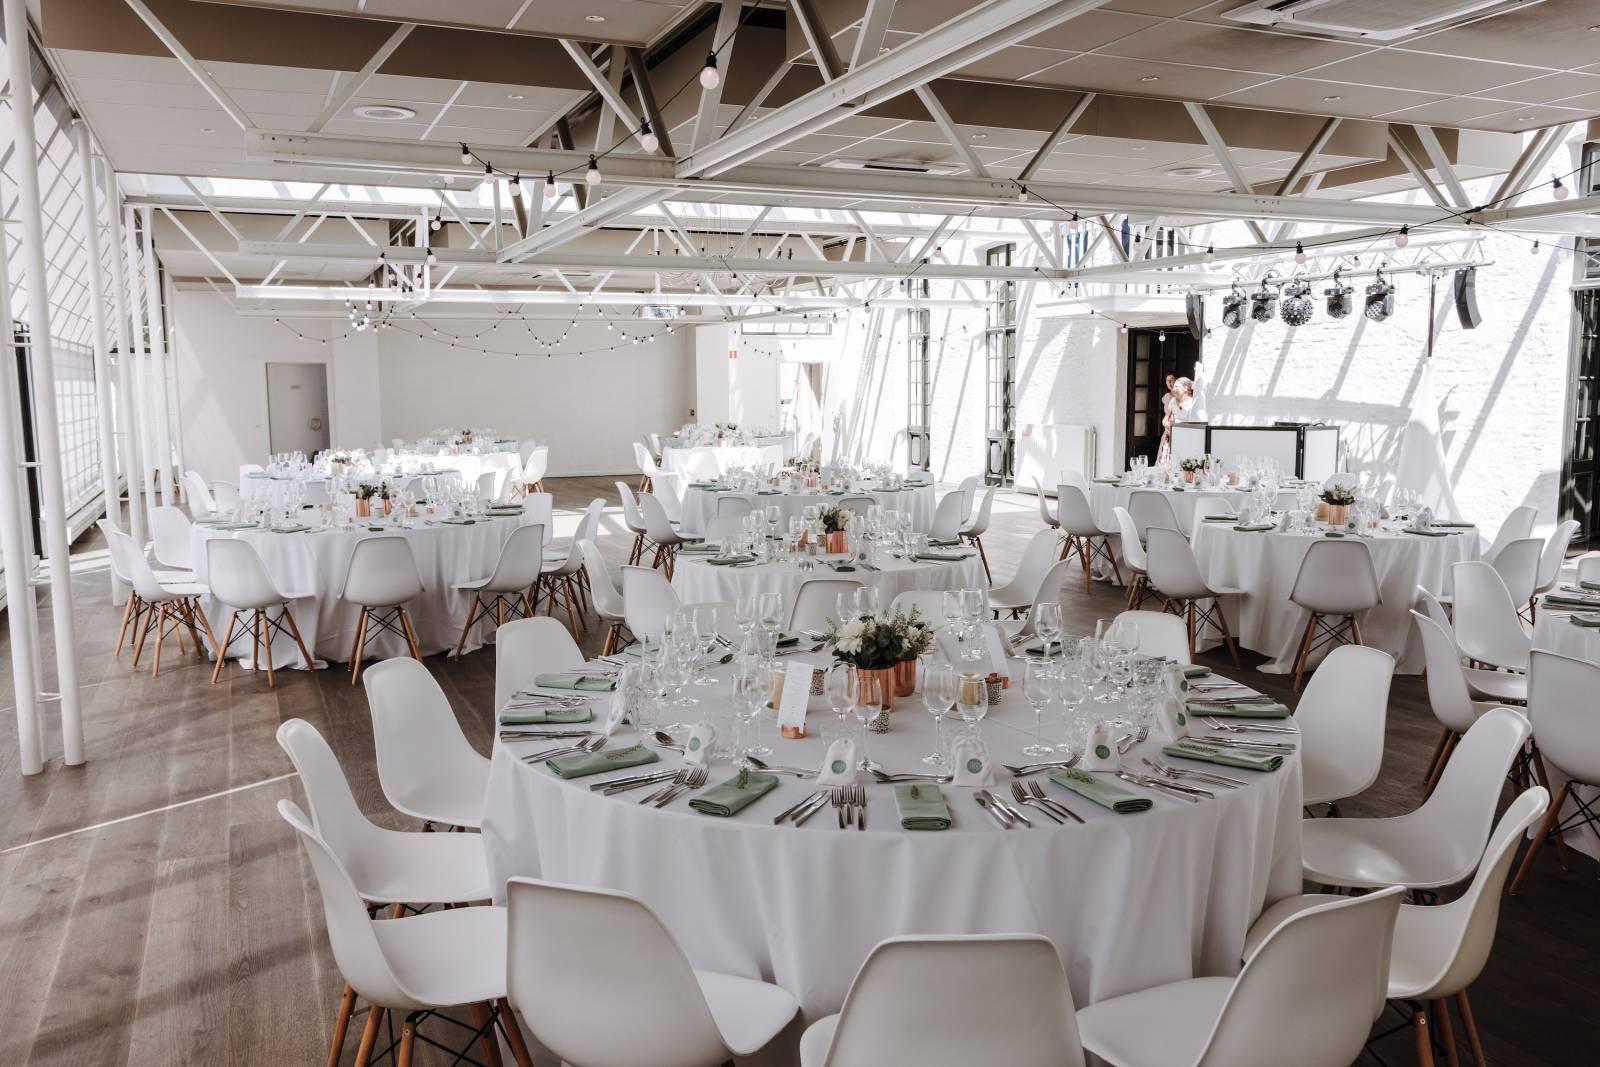 Atelier Rosé - Wedding Planner - House of Weddings Sara & Reinout - Djorden Vlaeminck (2)